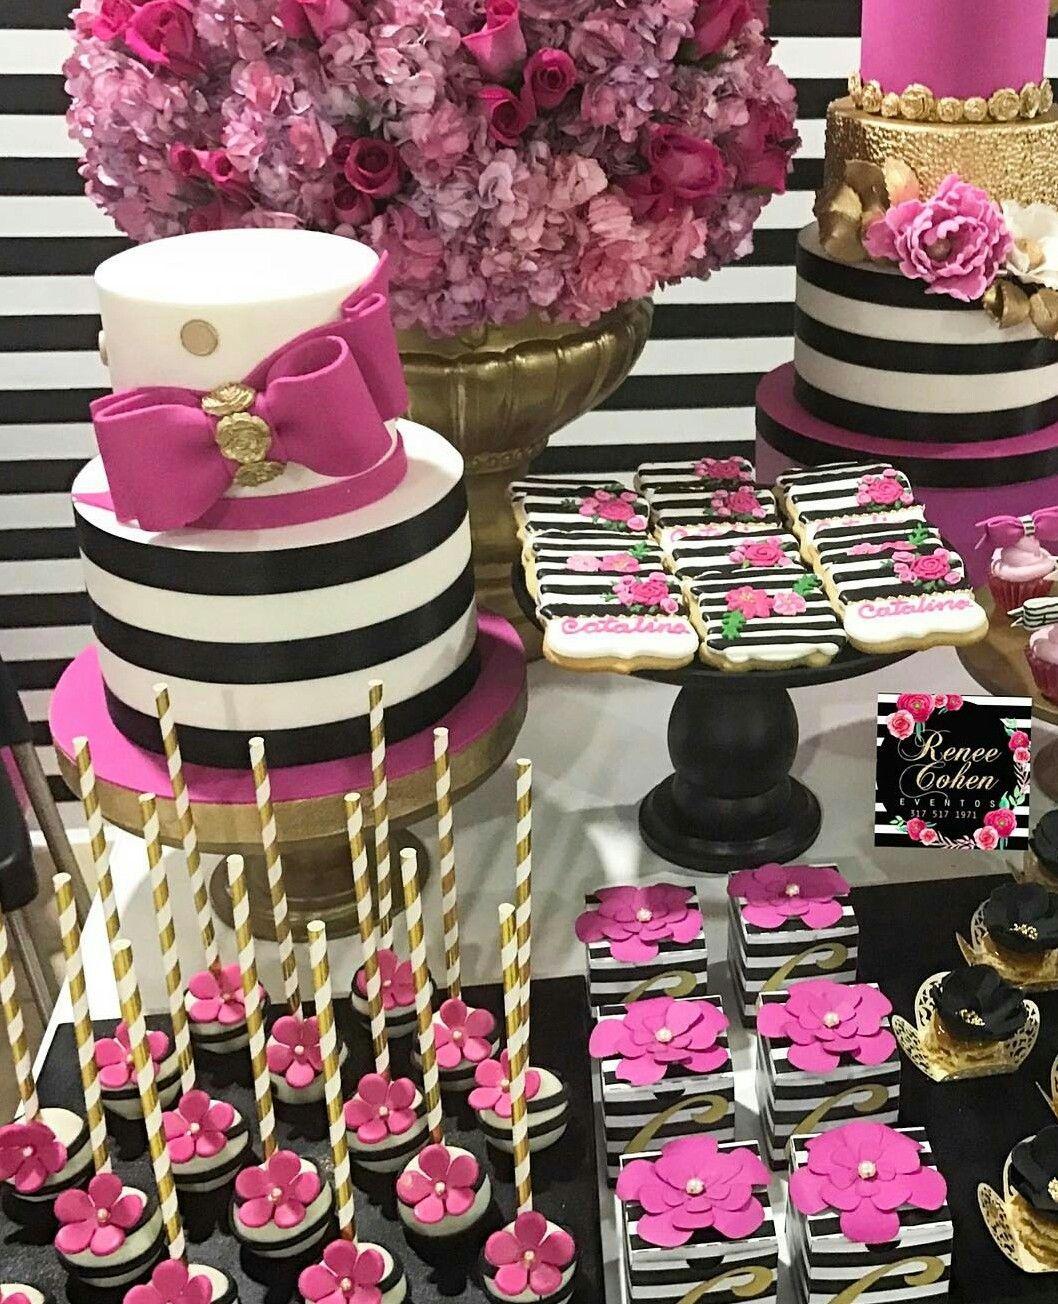 Pin by Toni Gifford on Lachanda 30th birthday in 2018 Pinterest Cumpleaños, Fiesta